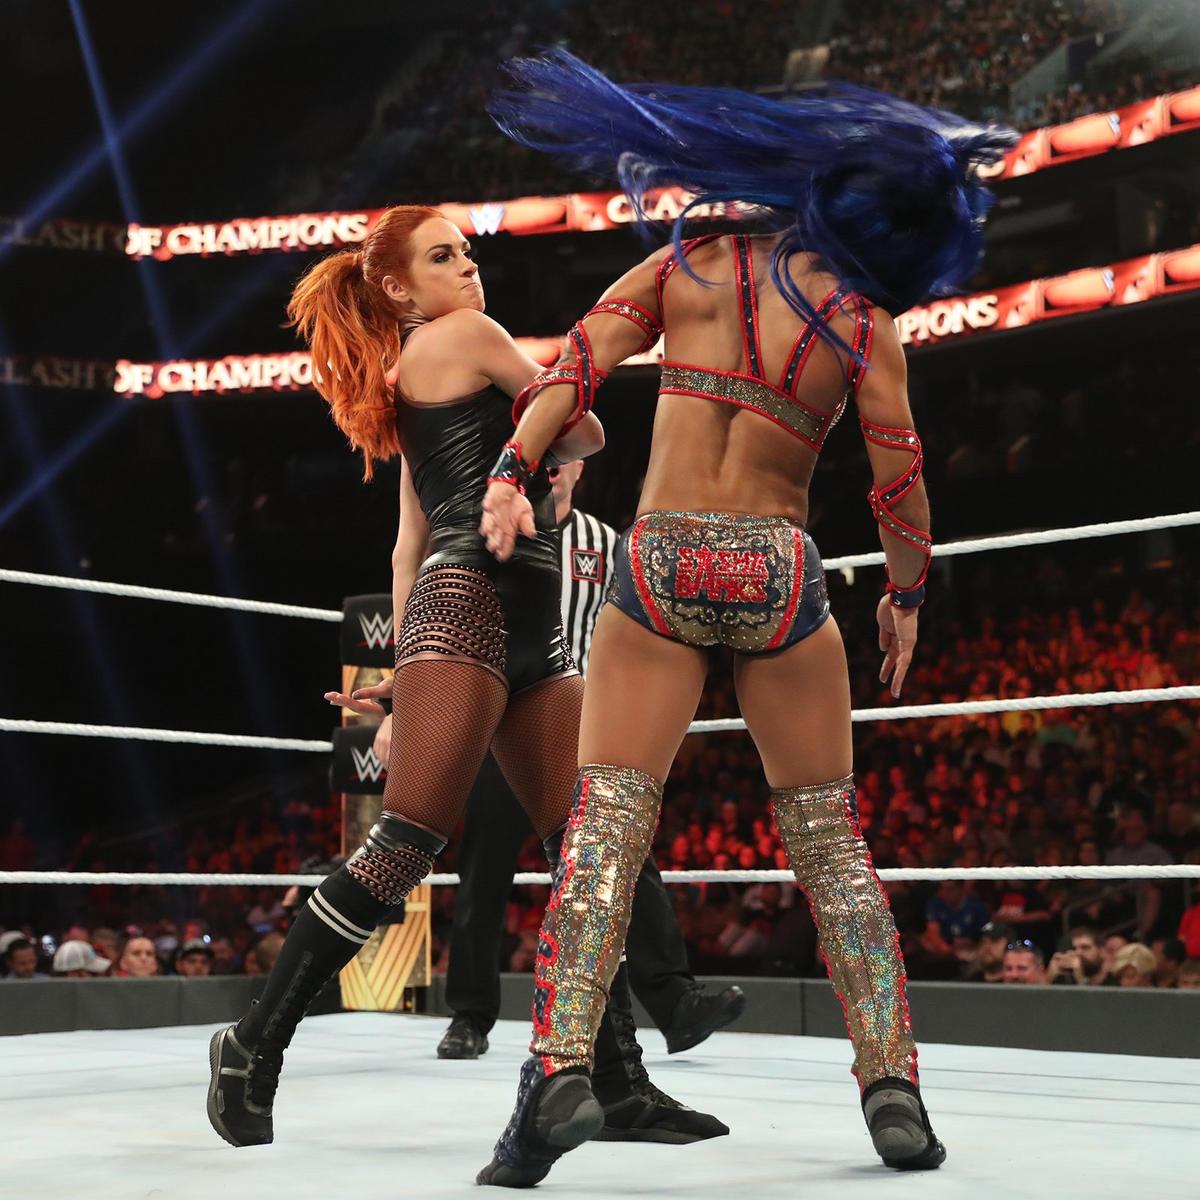 Becky Lynch Vs Sasha Banks Raw Women S Championship Match Photos Wwe